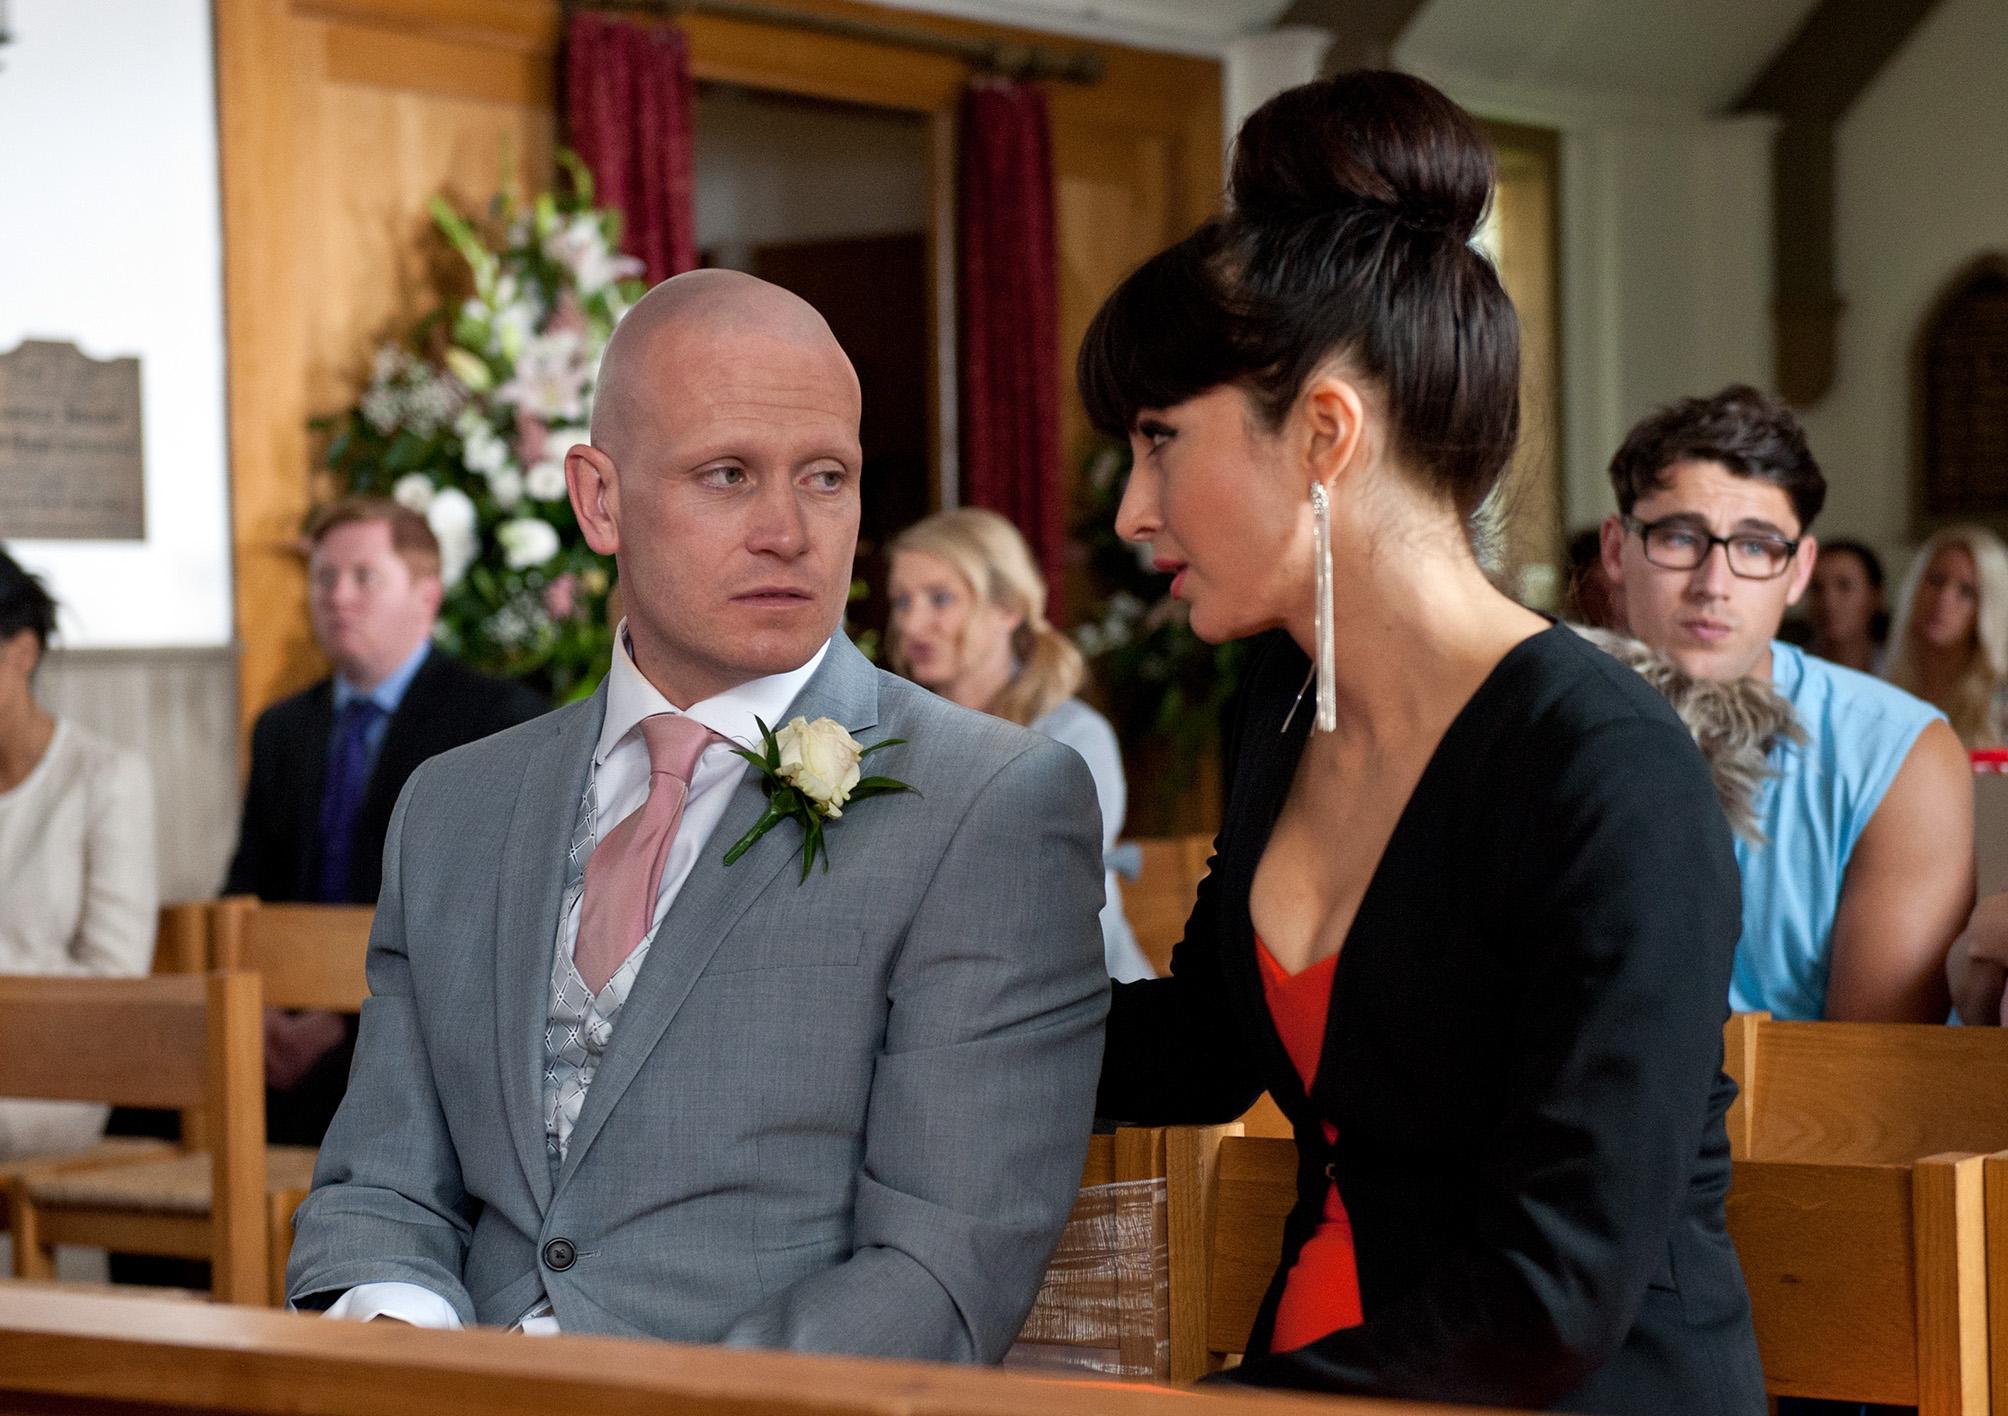 Emmerdale spoilers: Wedding day heartbreak for David Metcalfe